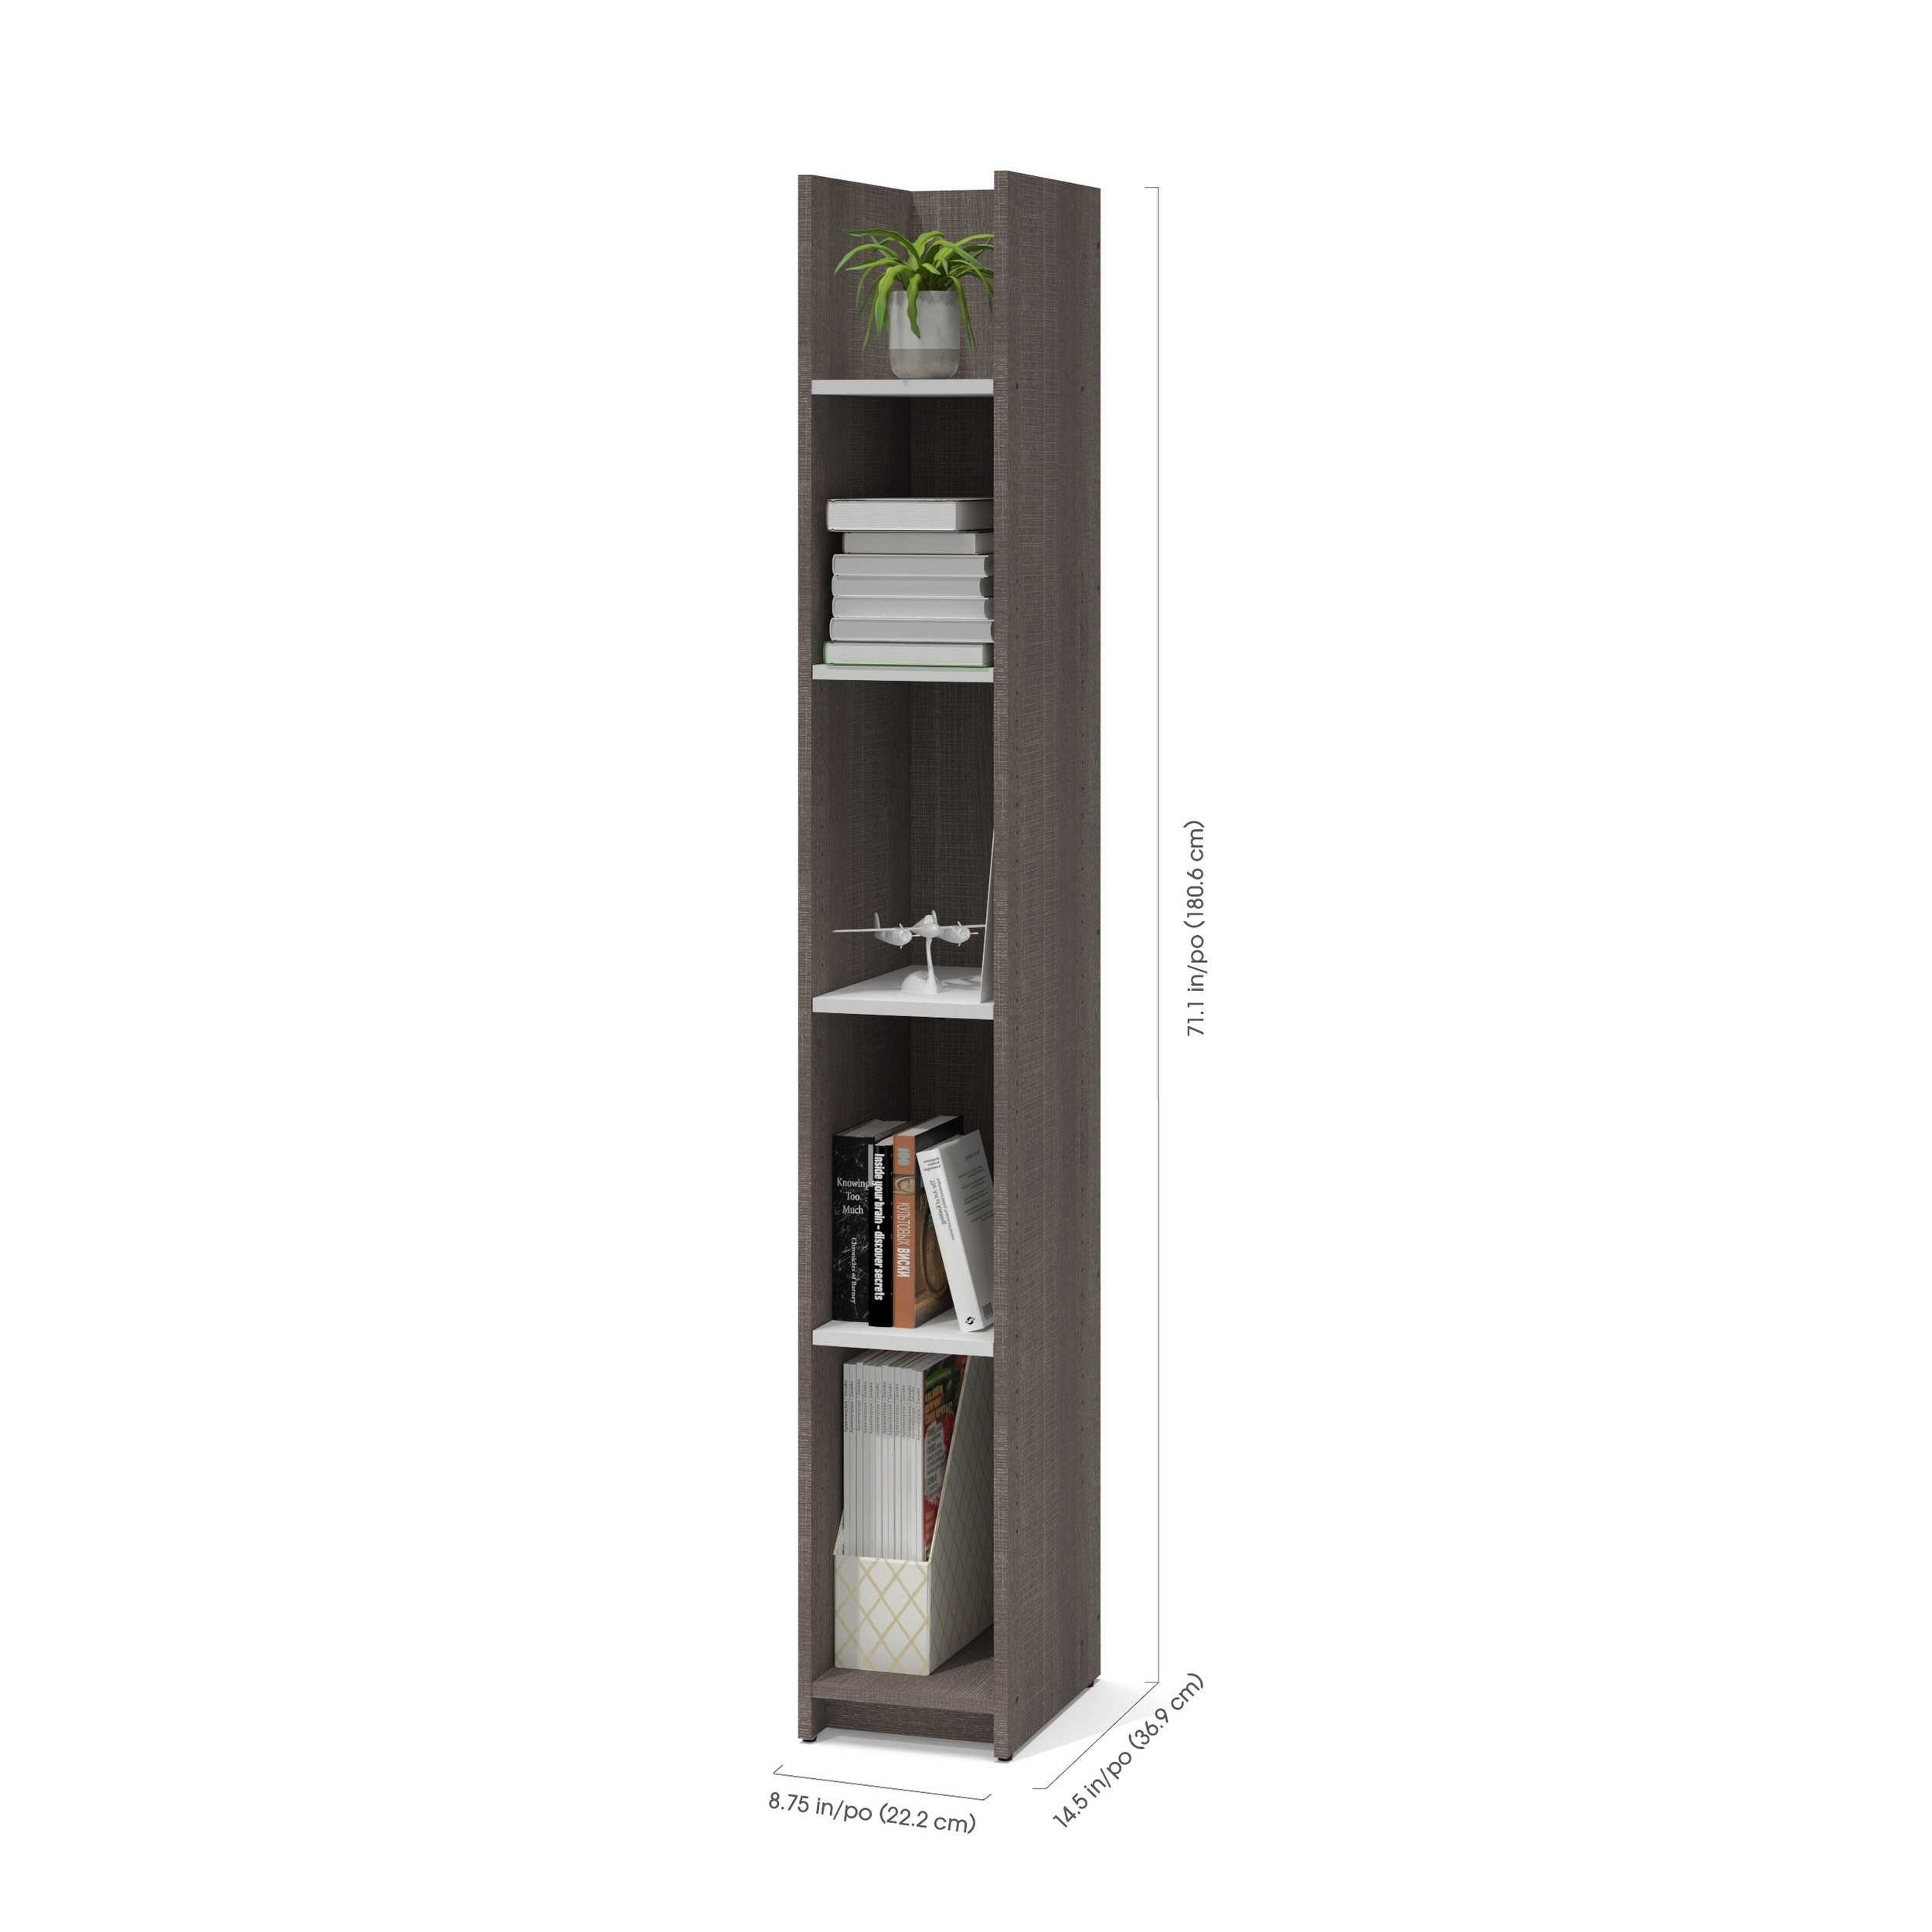 Bestar Small Space 10 Inch Storage Tower